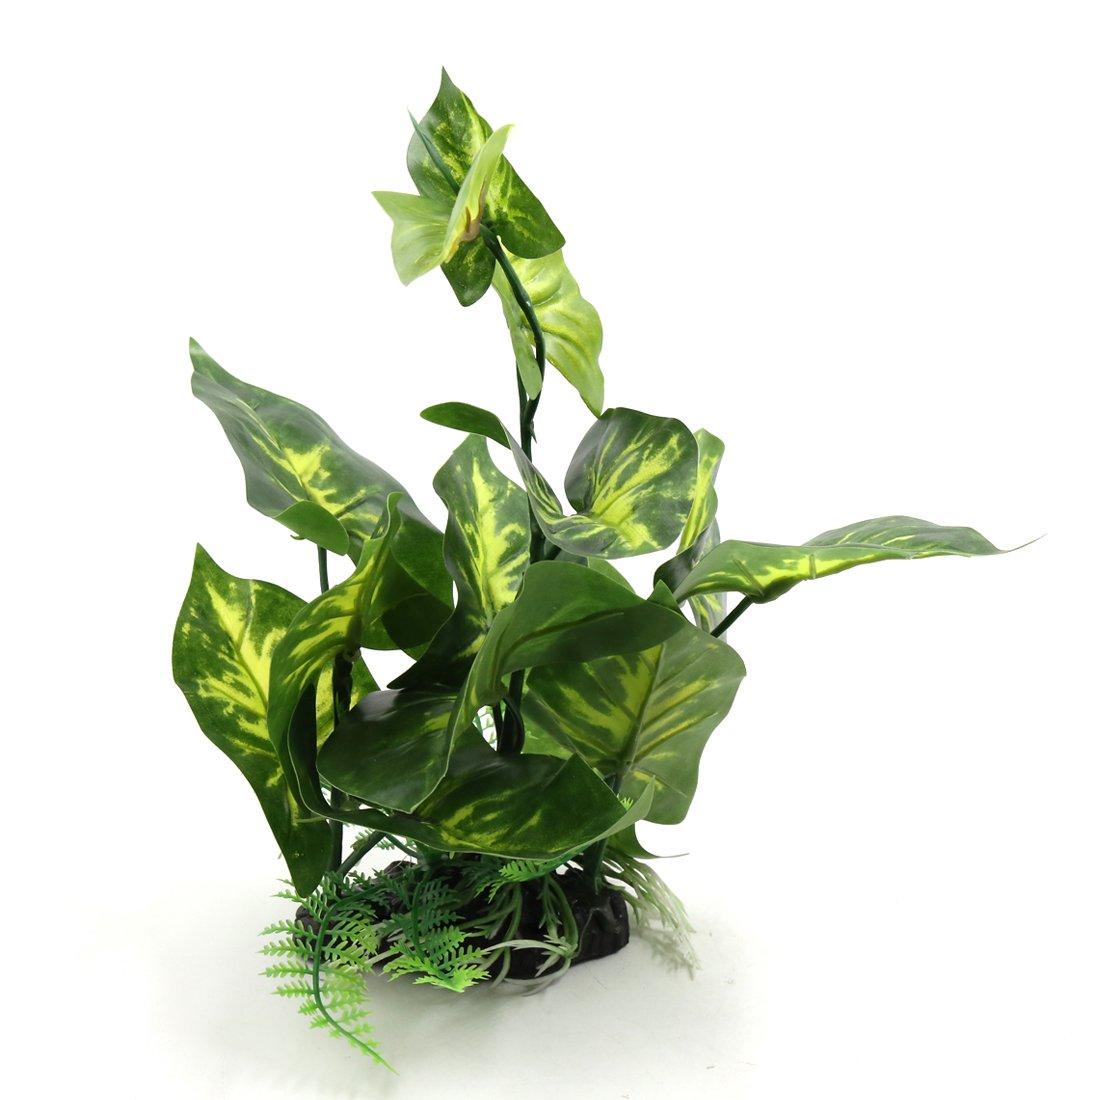 uxcell Green Plastic Terrarium Tank Lifelike Plant Decorative Ornament for Reptiles Amphibians a17062800ux0838